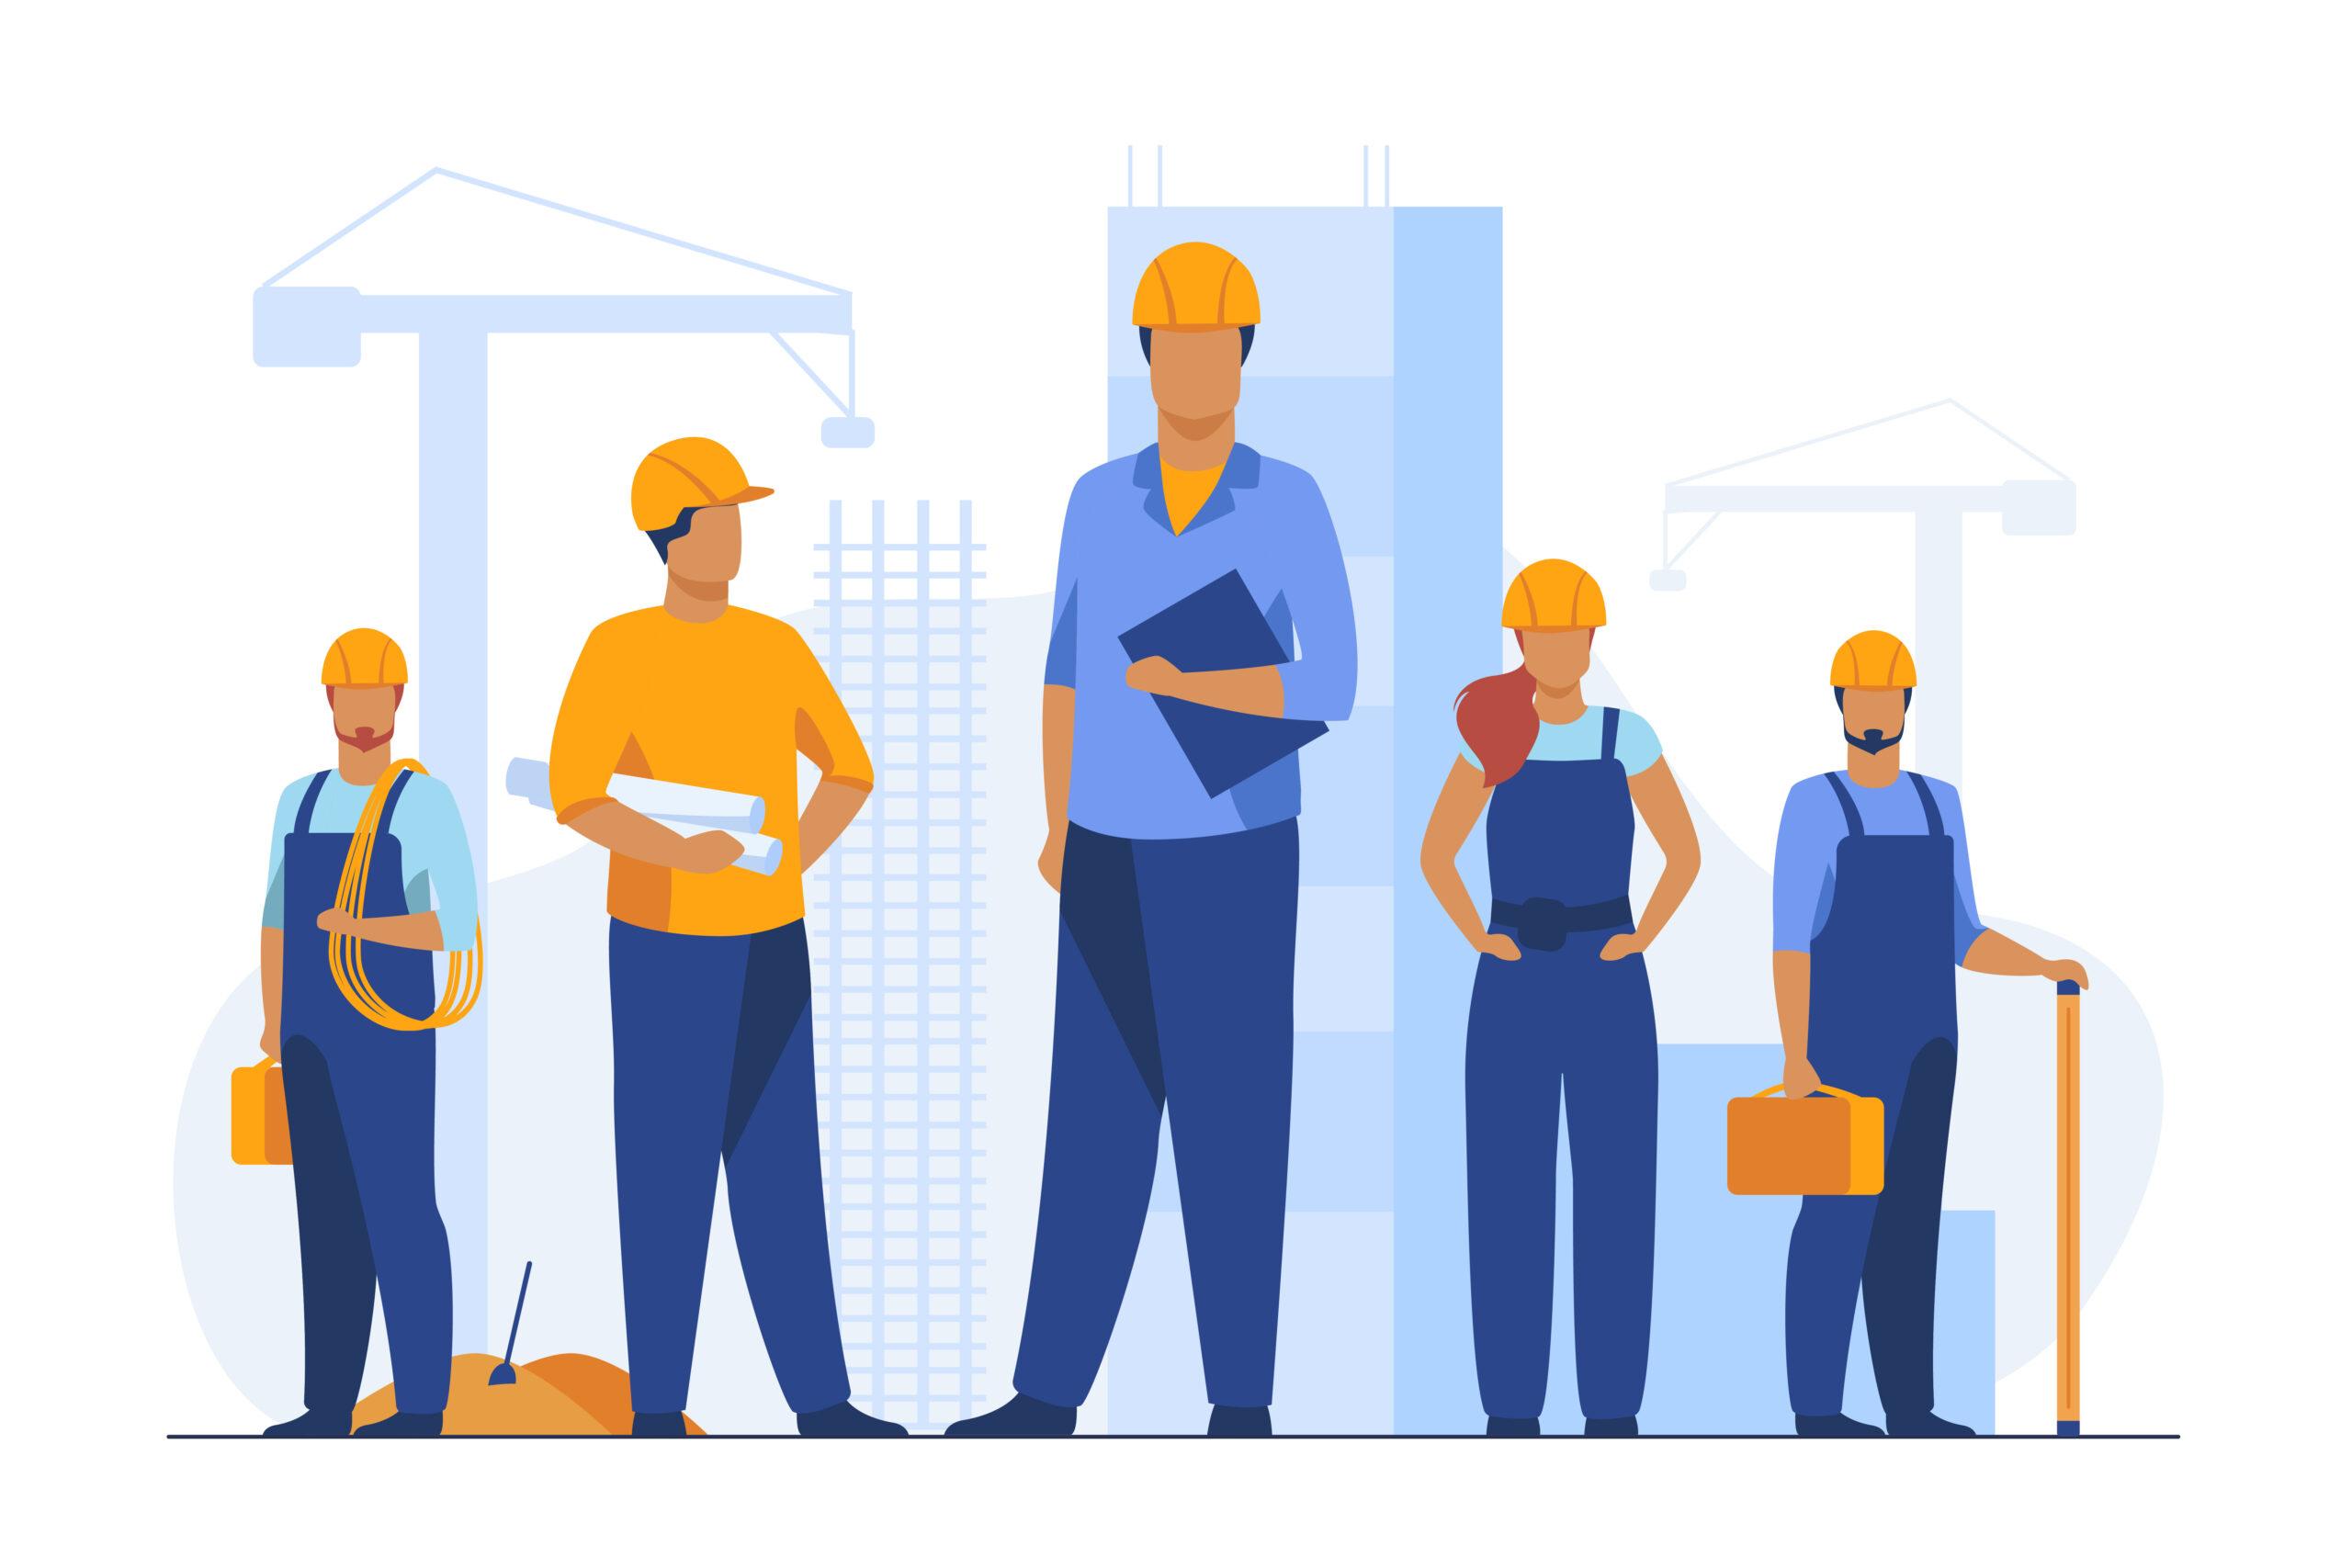 Design & Engineering Services